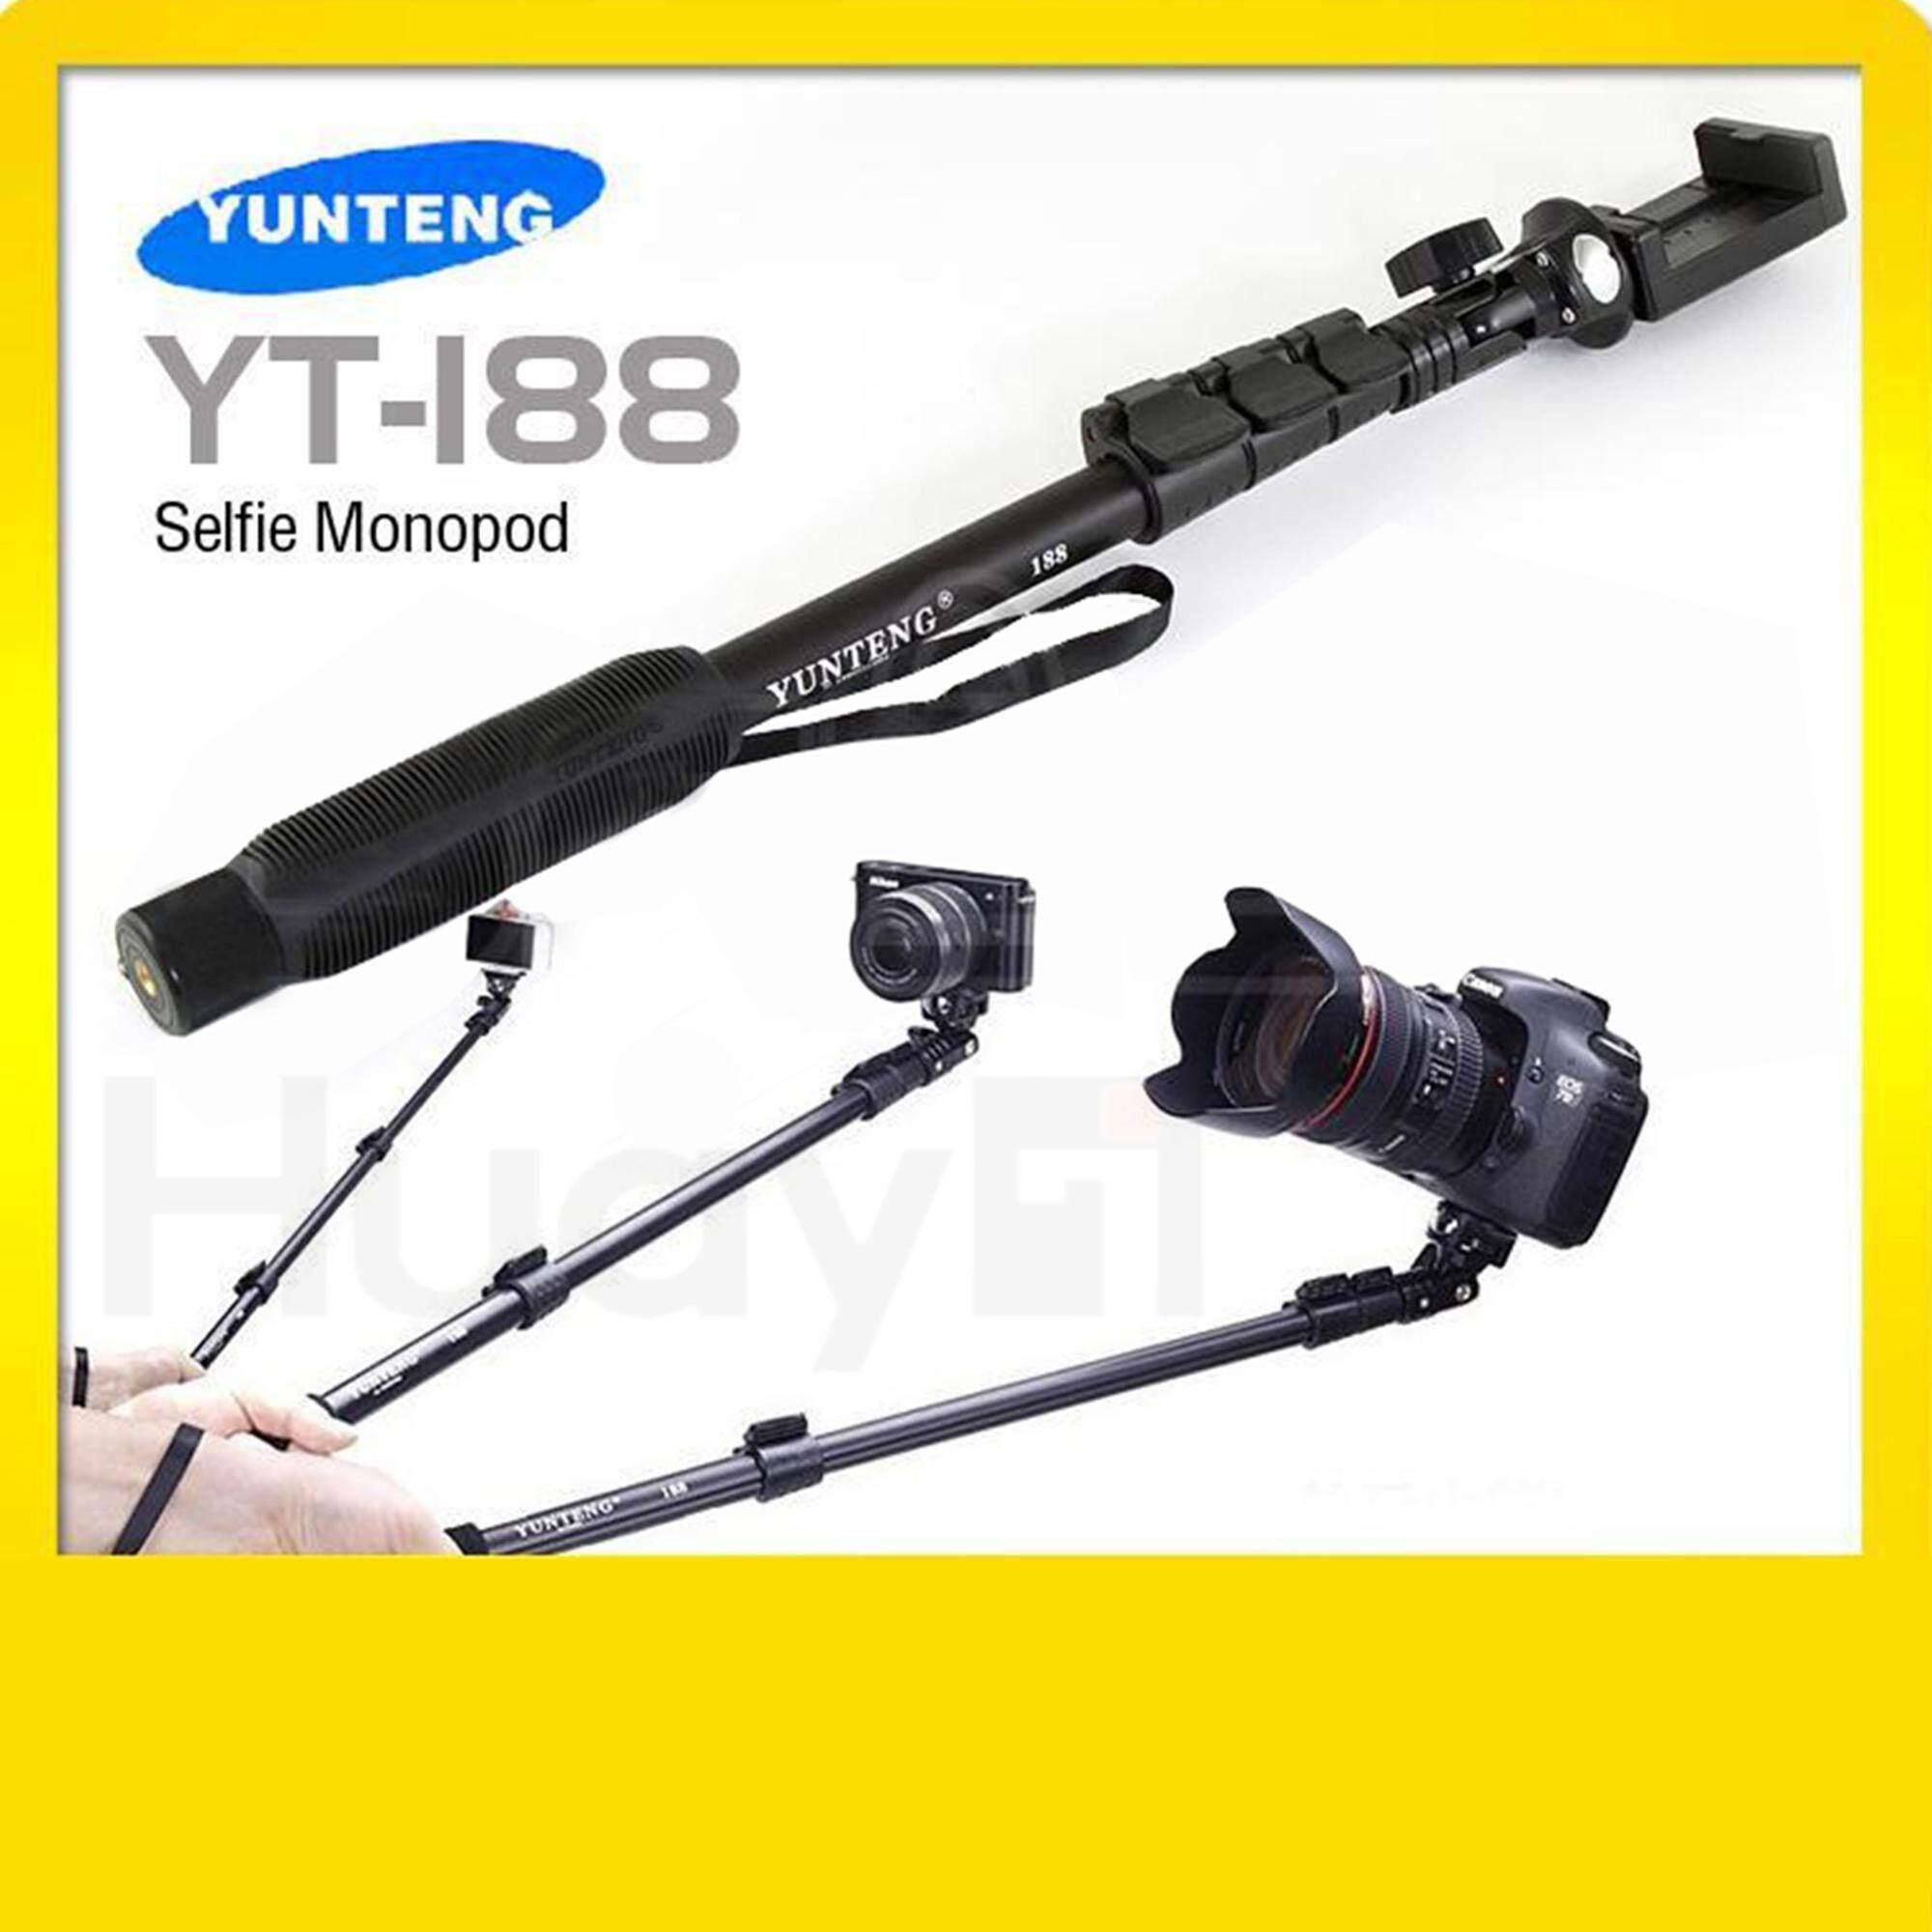 Yunteng ไม้เซลฟี่ Monopod โมโนพอด 2018 รุ่น Yt-188 (สีดำ) ใช้เซลฟี่ได้กับสมาร์ทโฟน หรือกล้องคอมแพ็ค.